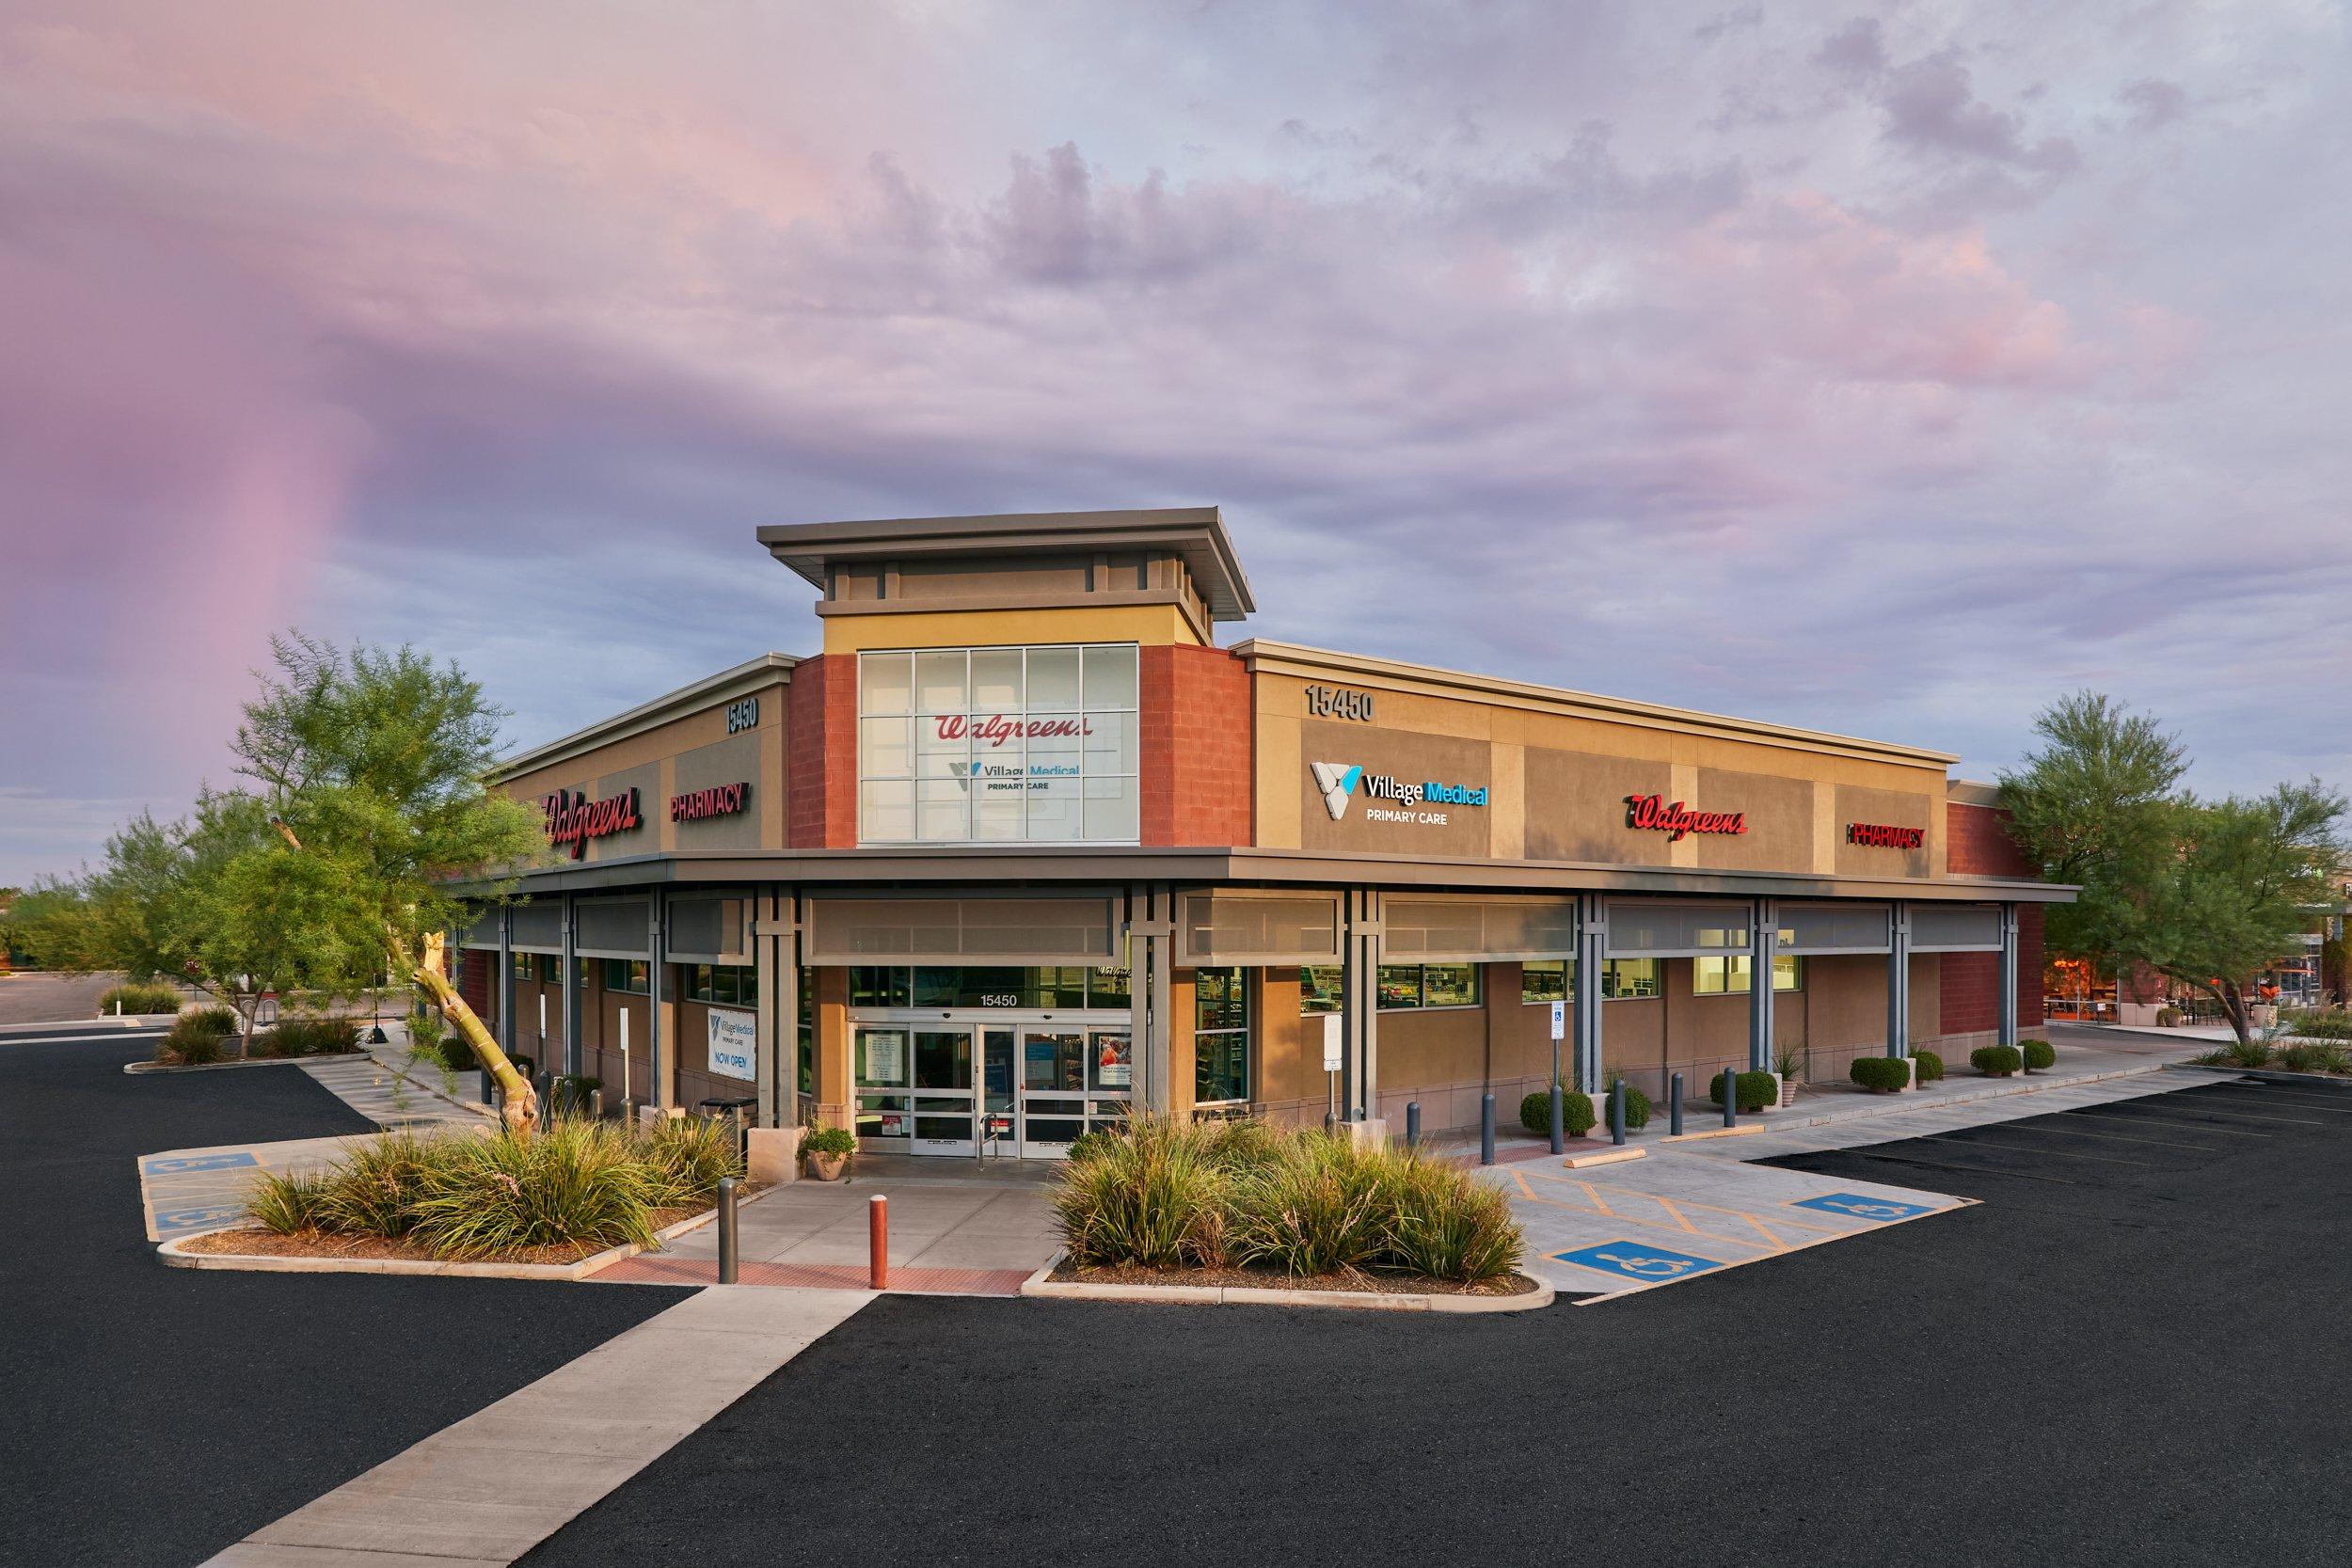 Village Medical at Walgreens - Hiawassee - 5601 N. Hiawassee Rd. Suite 100 Orlando, FL 32818